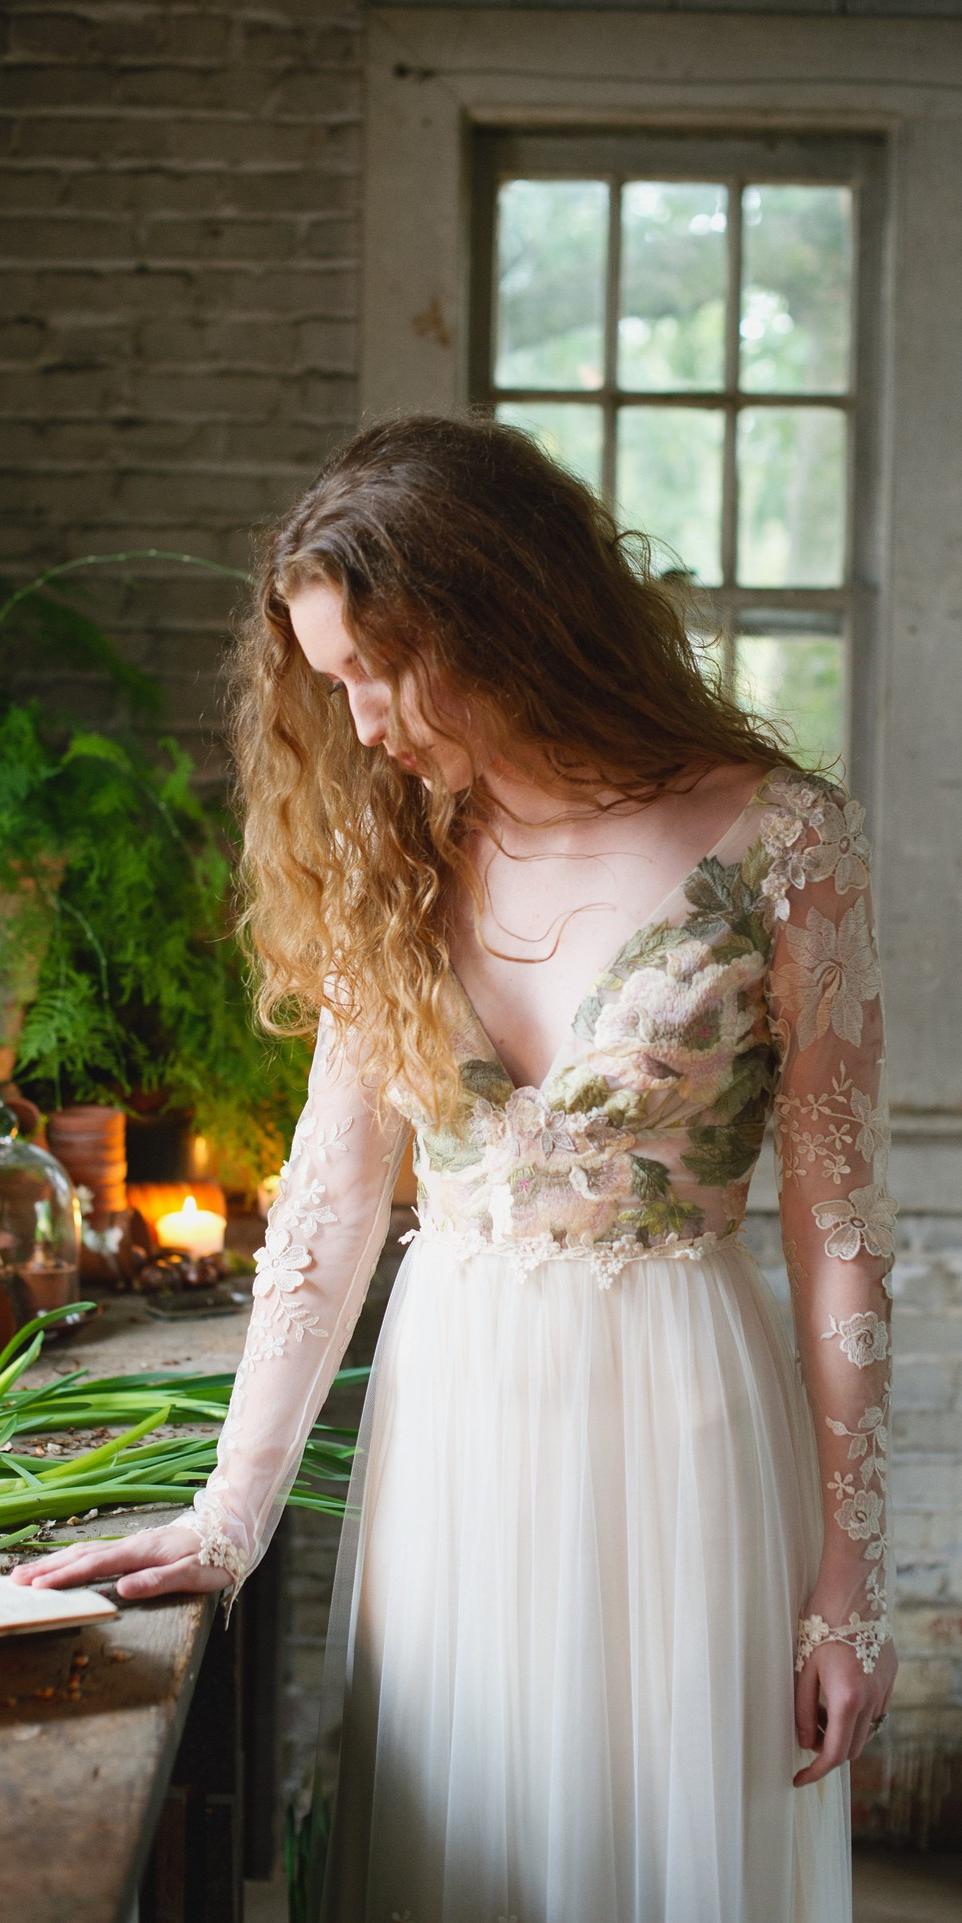 Primavera Gown Embroidered Wedding Dress Boho Wedding Dress Floral Wedding Dress